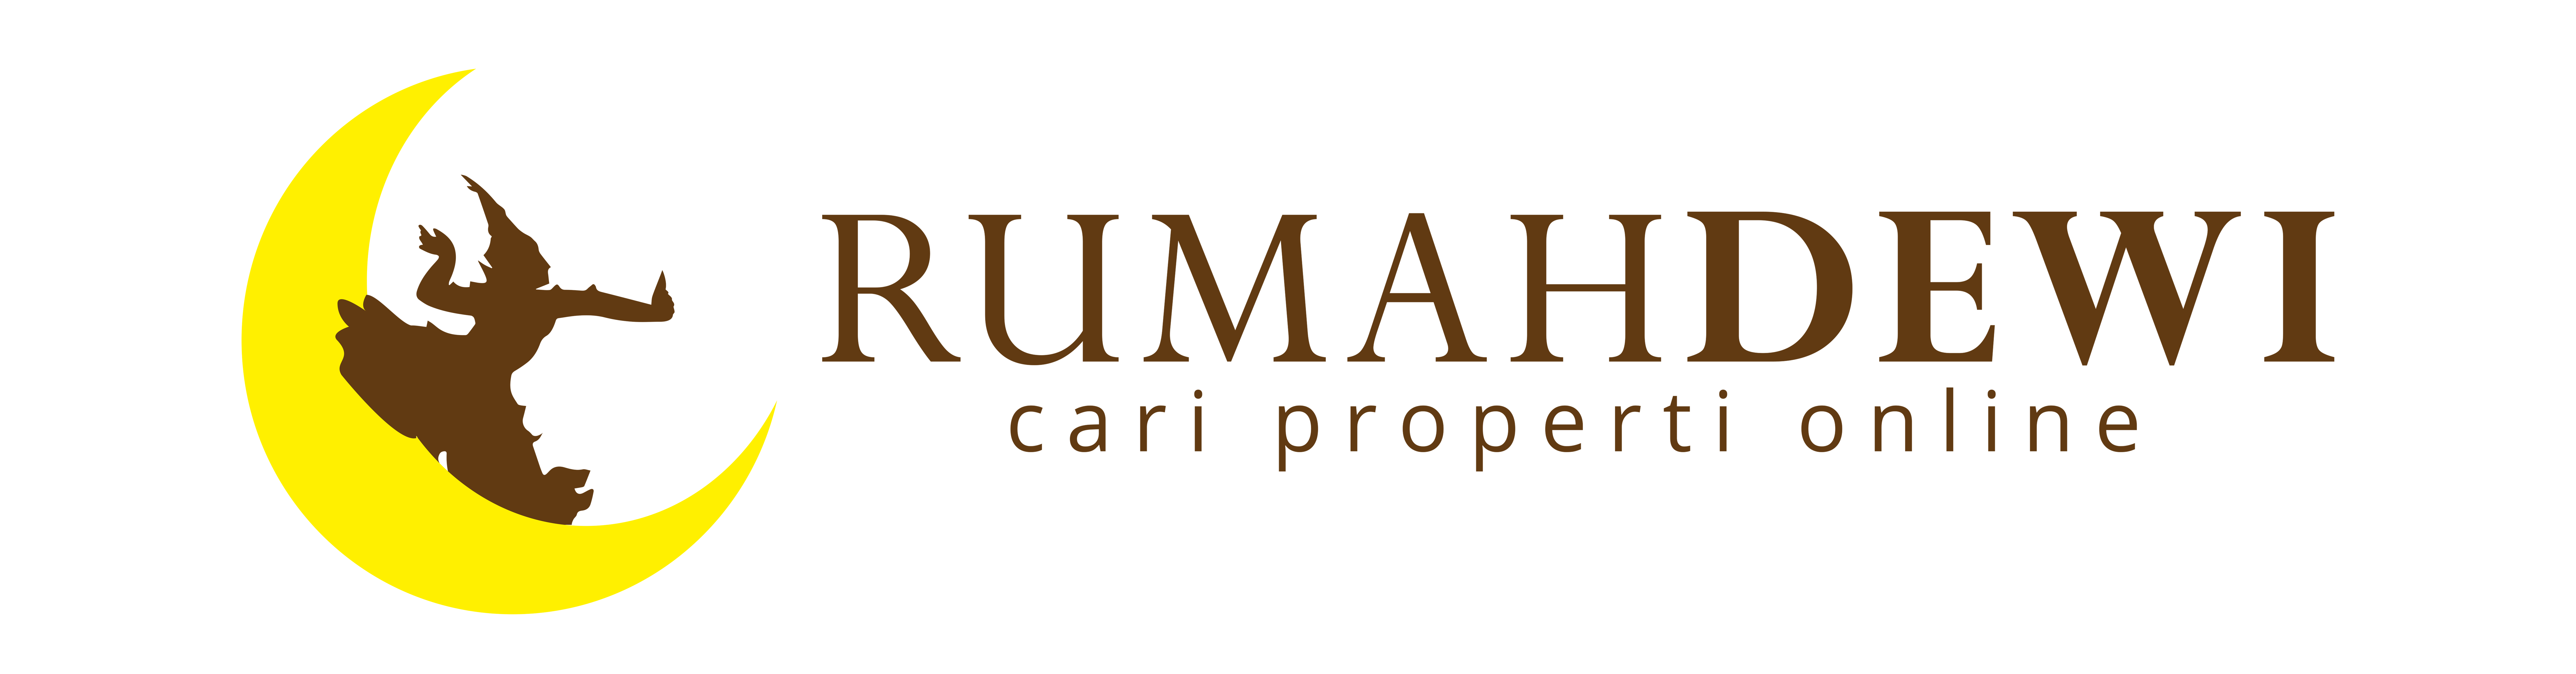 logo rumahdewi